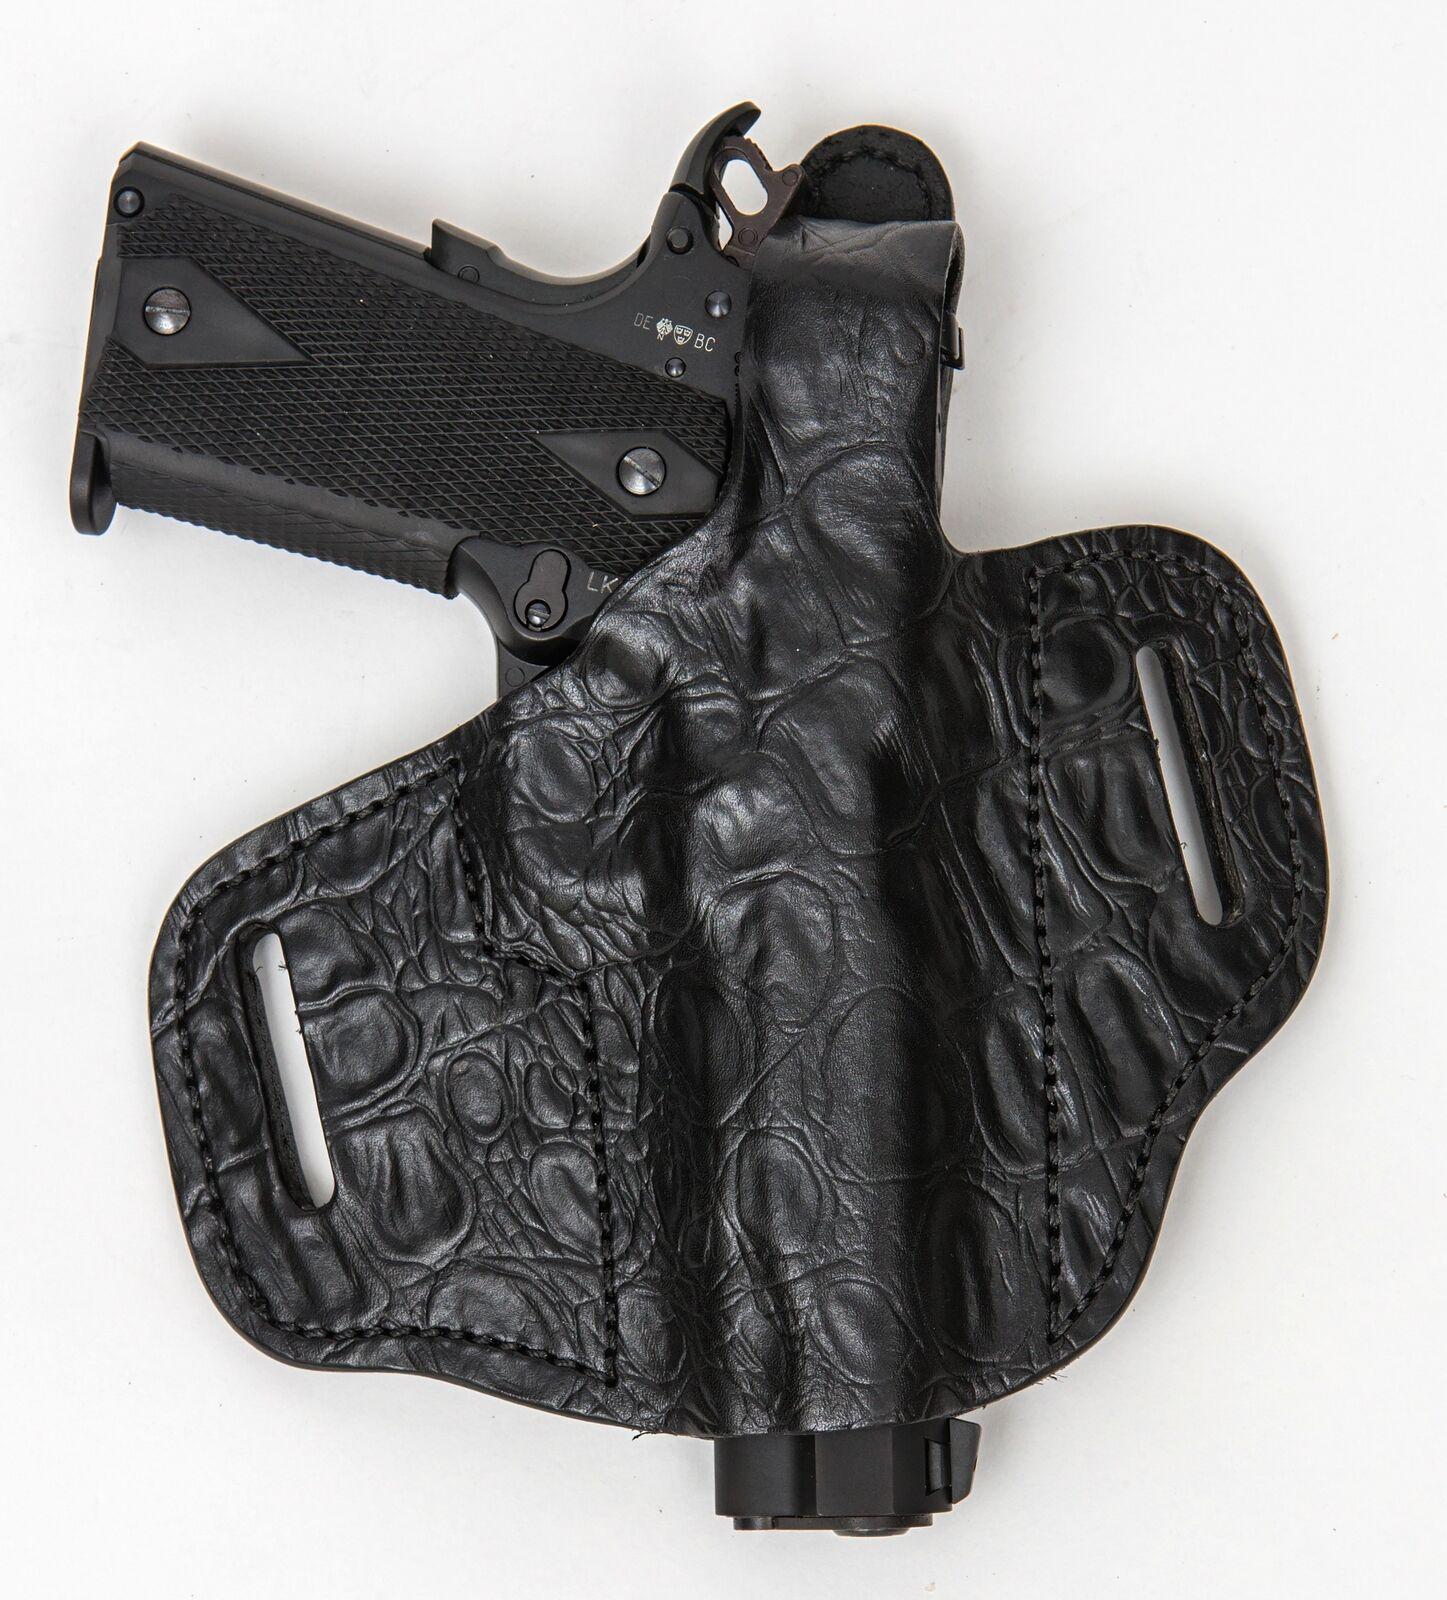 On Duty Conceal RH LH OWB Leder Gun Holster For Springfield 1911 3